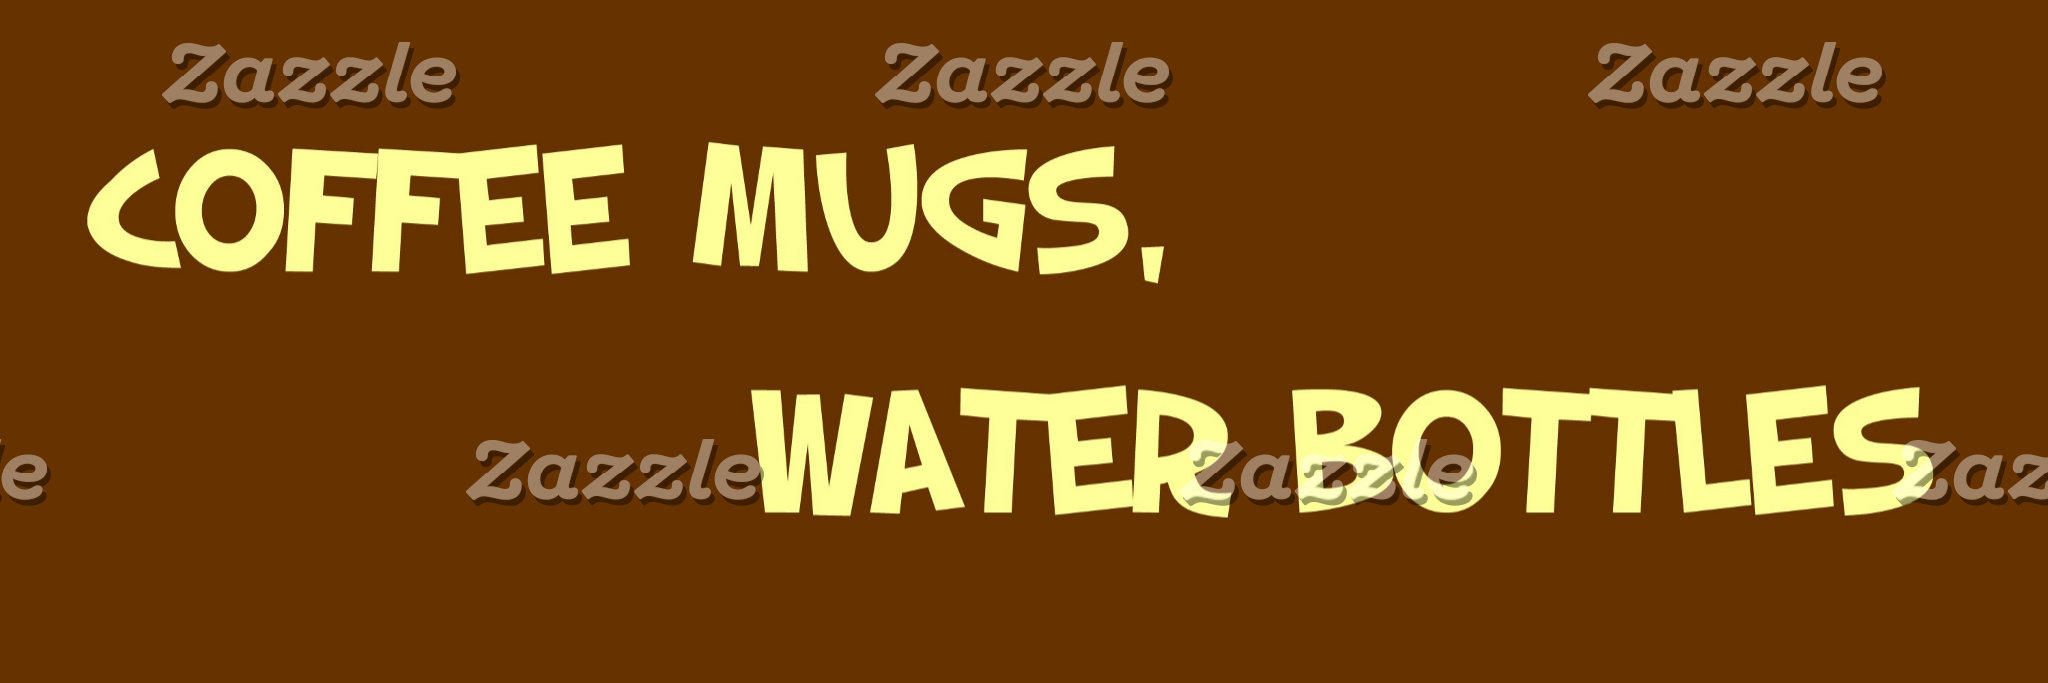 COFFEE MUGS, WATER BOTTLES